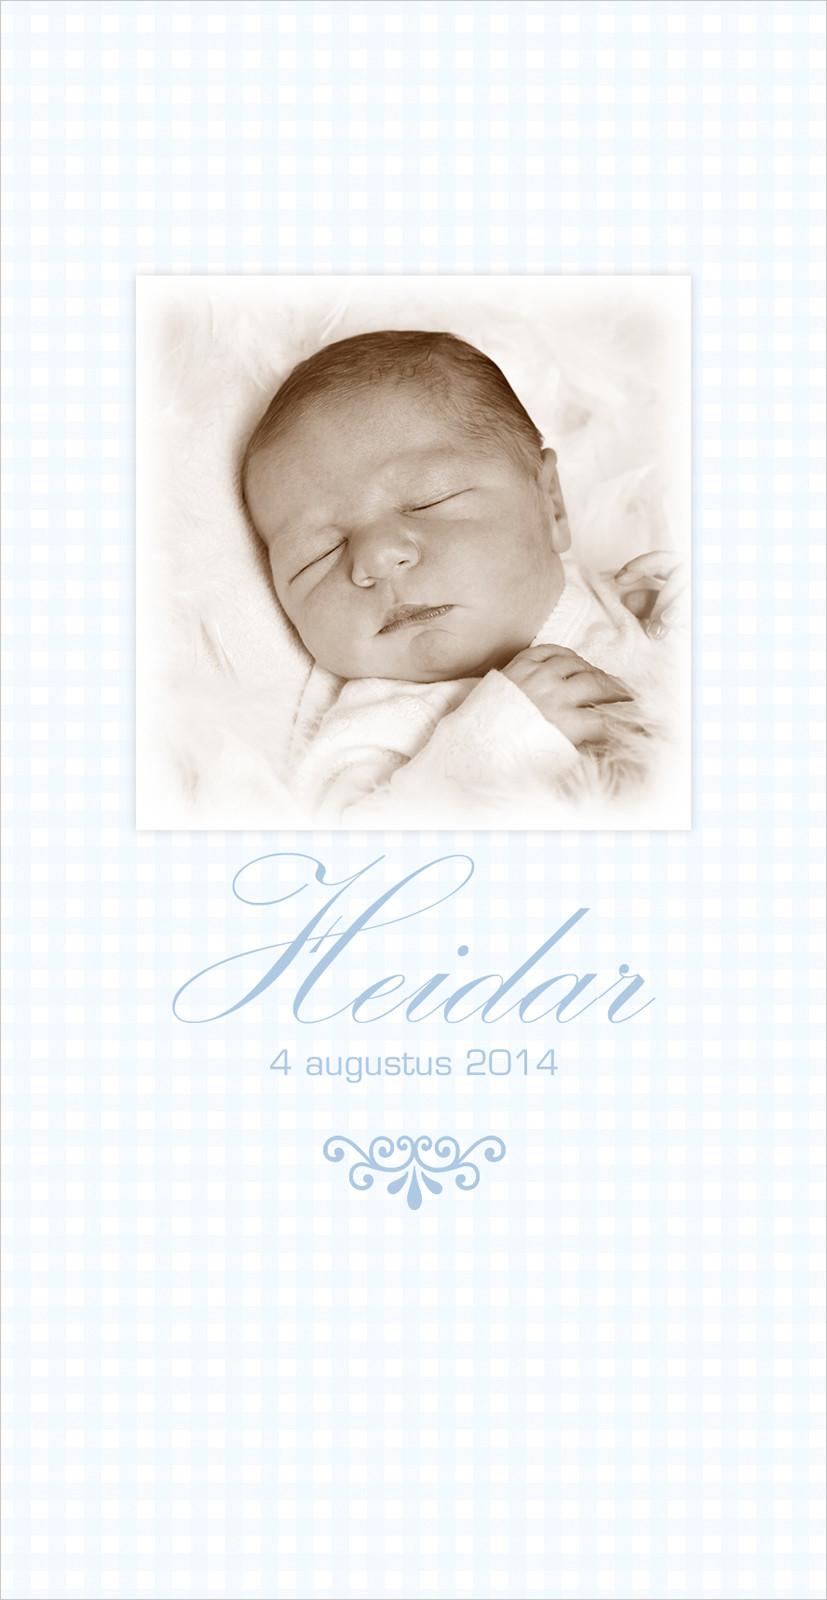 Geboortekaartje met foto van Heidar